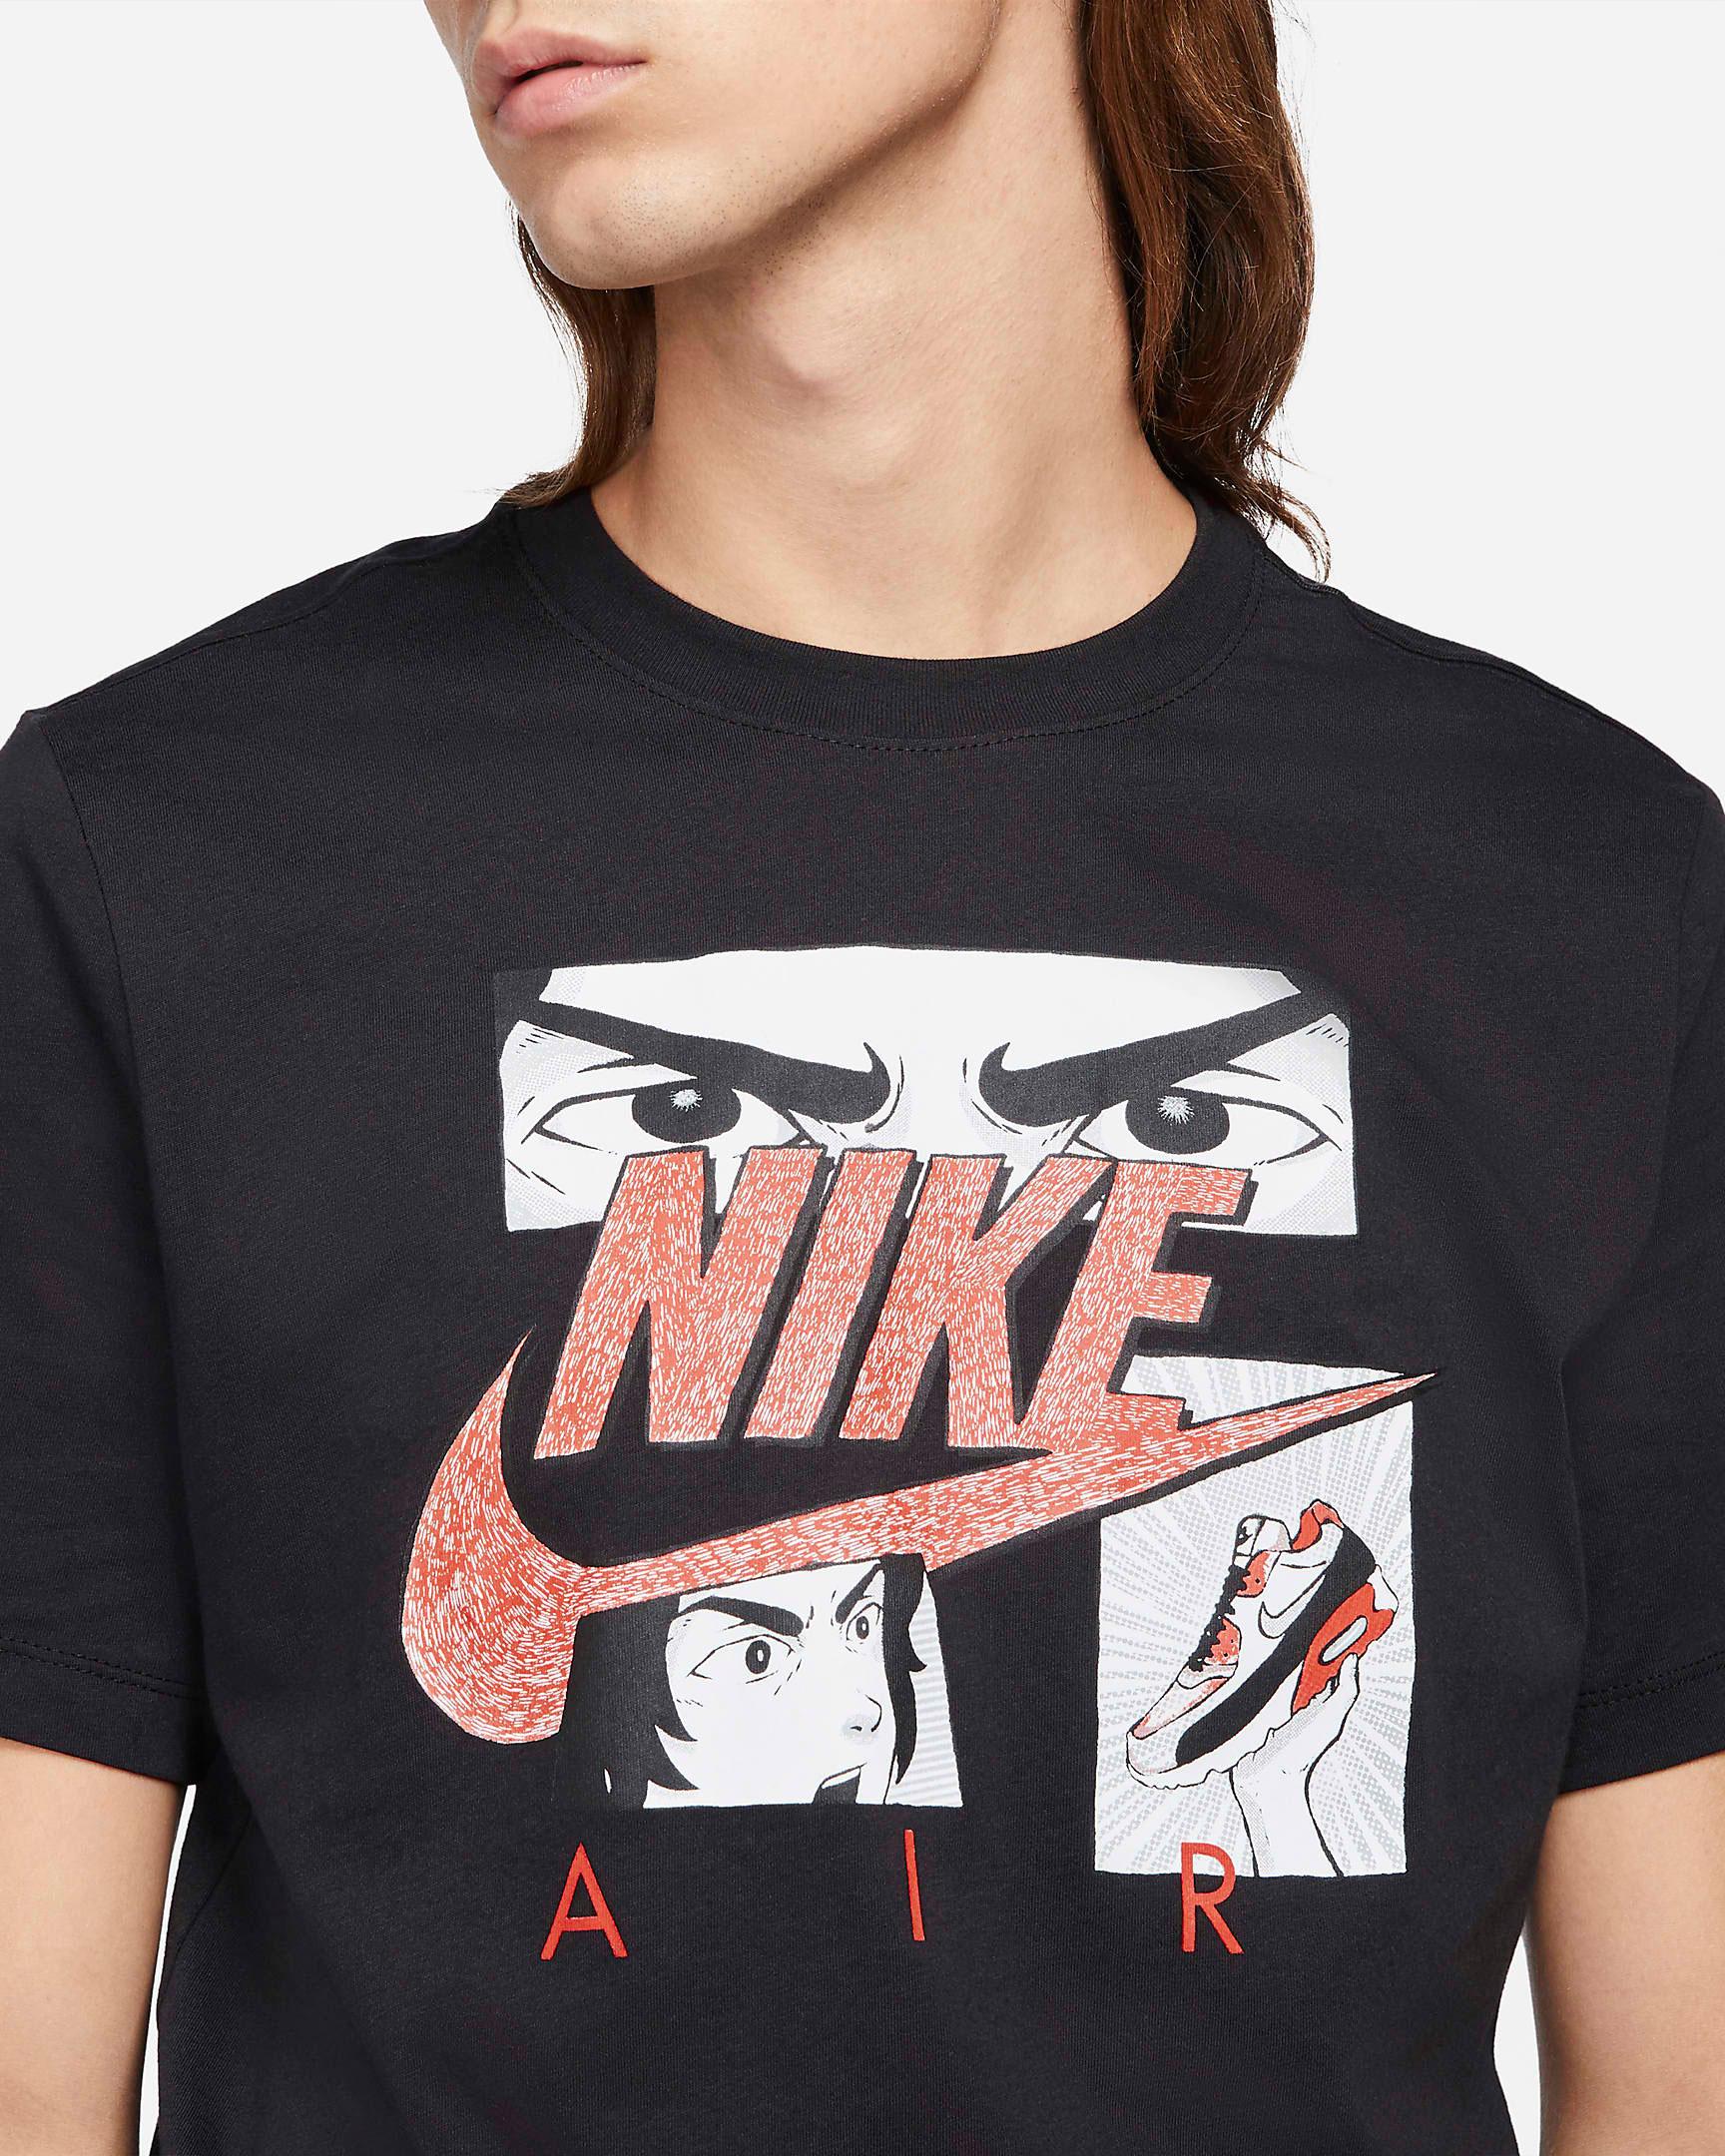 nike-air-max-90-infrared-radiant-red-manga-shirt-black-1